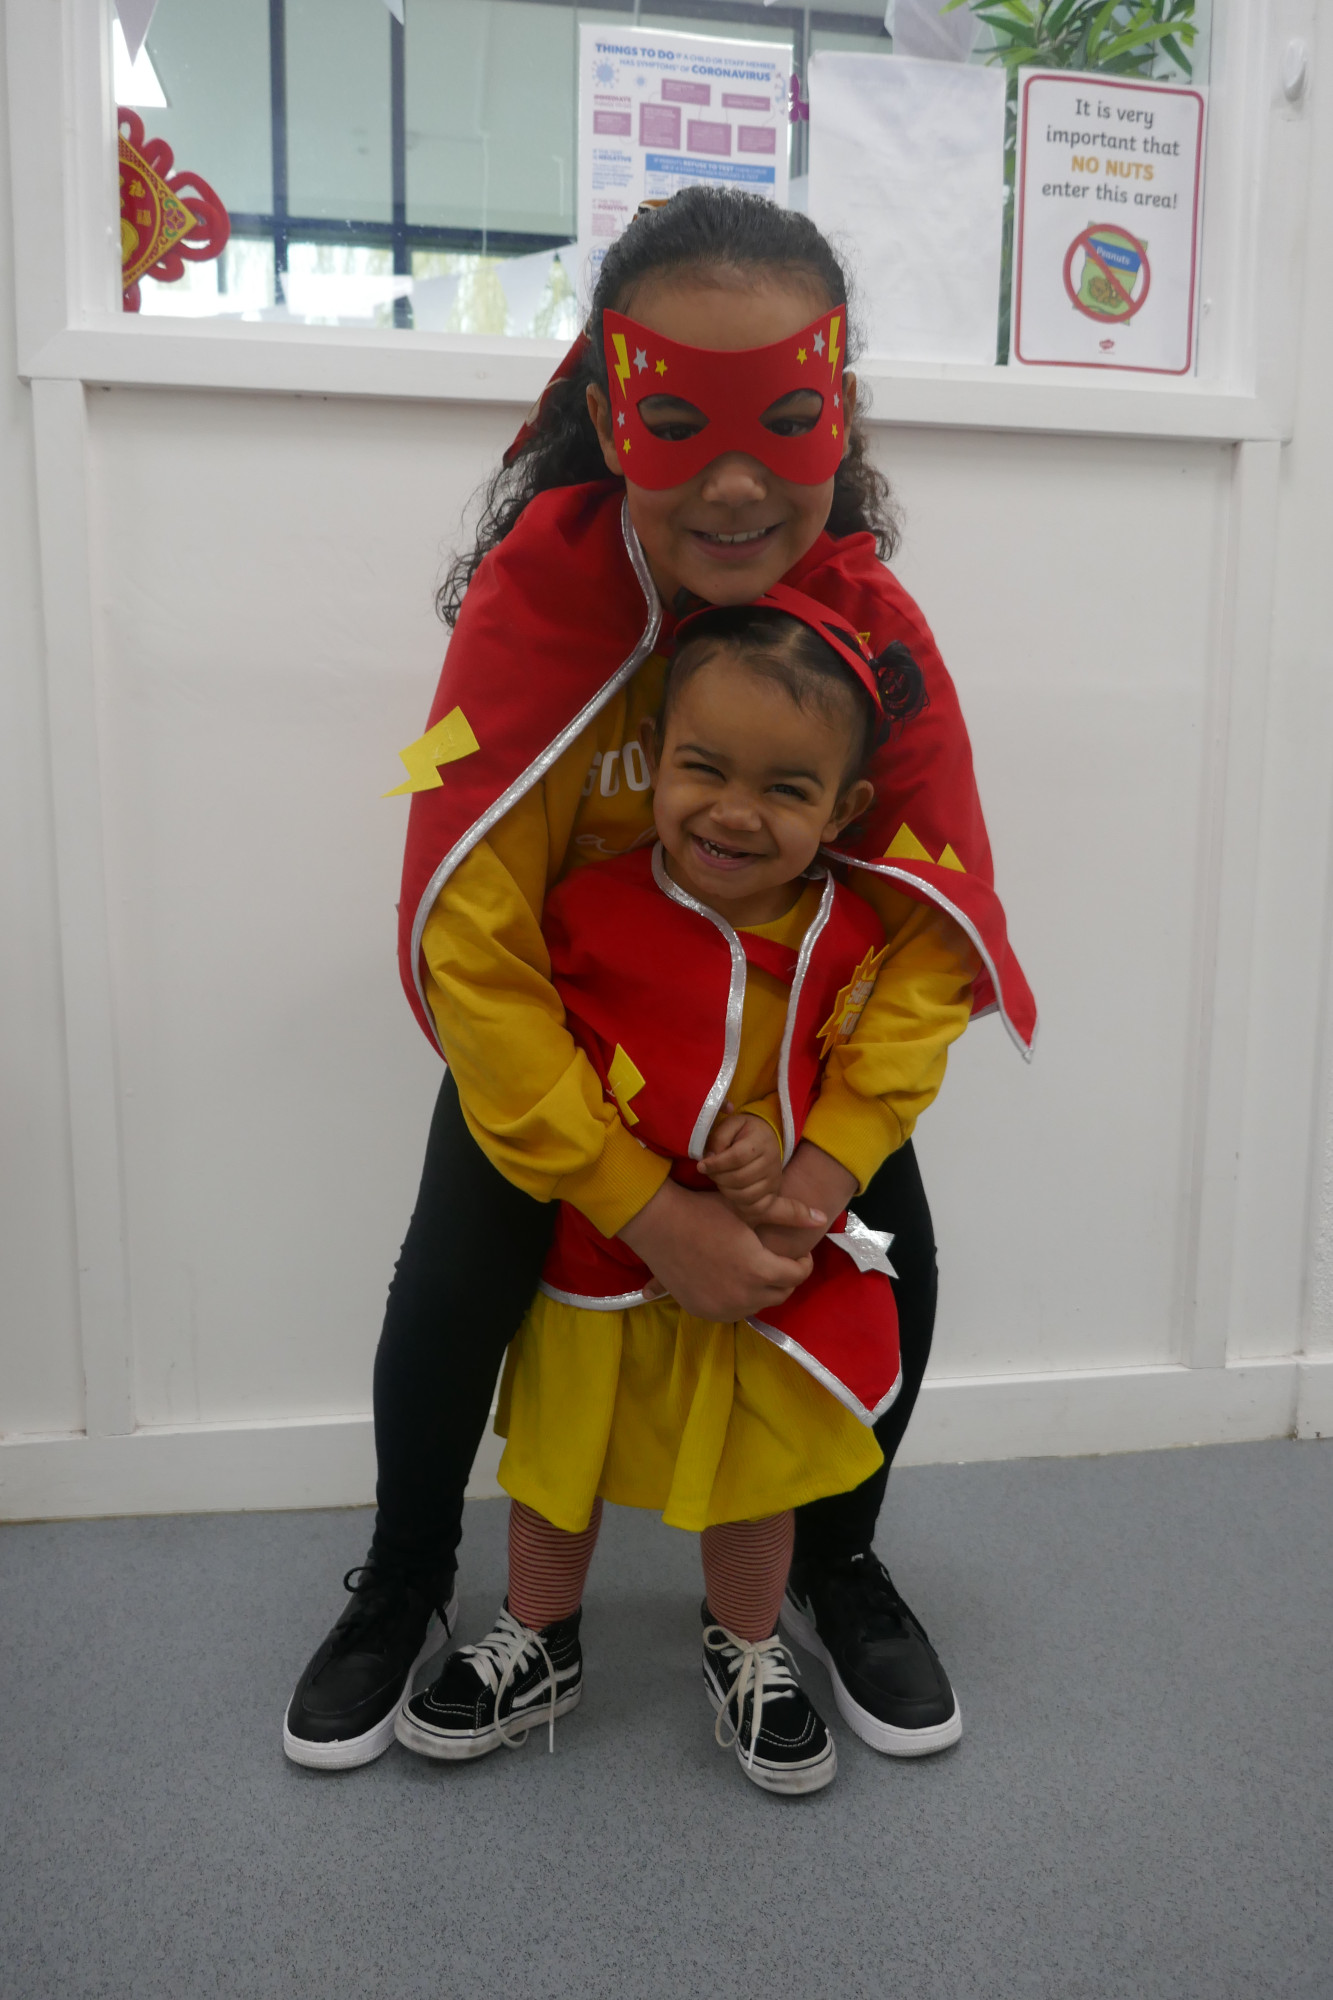 Children dressed as Super Heroes